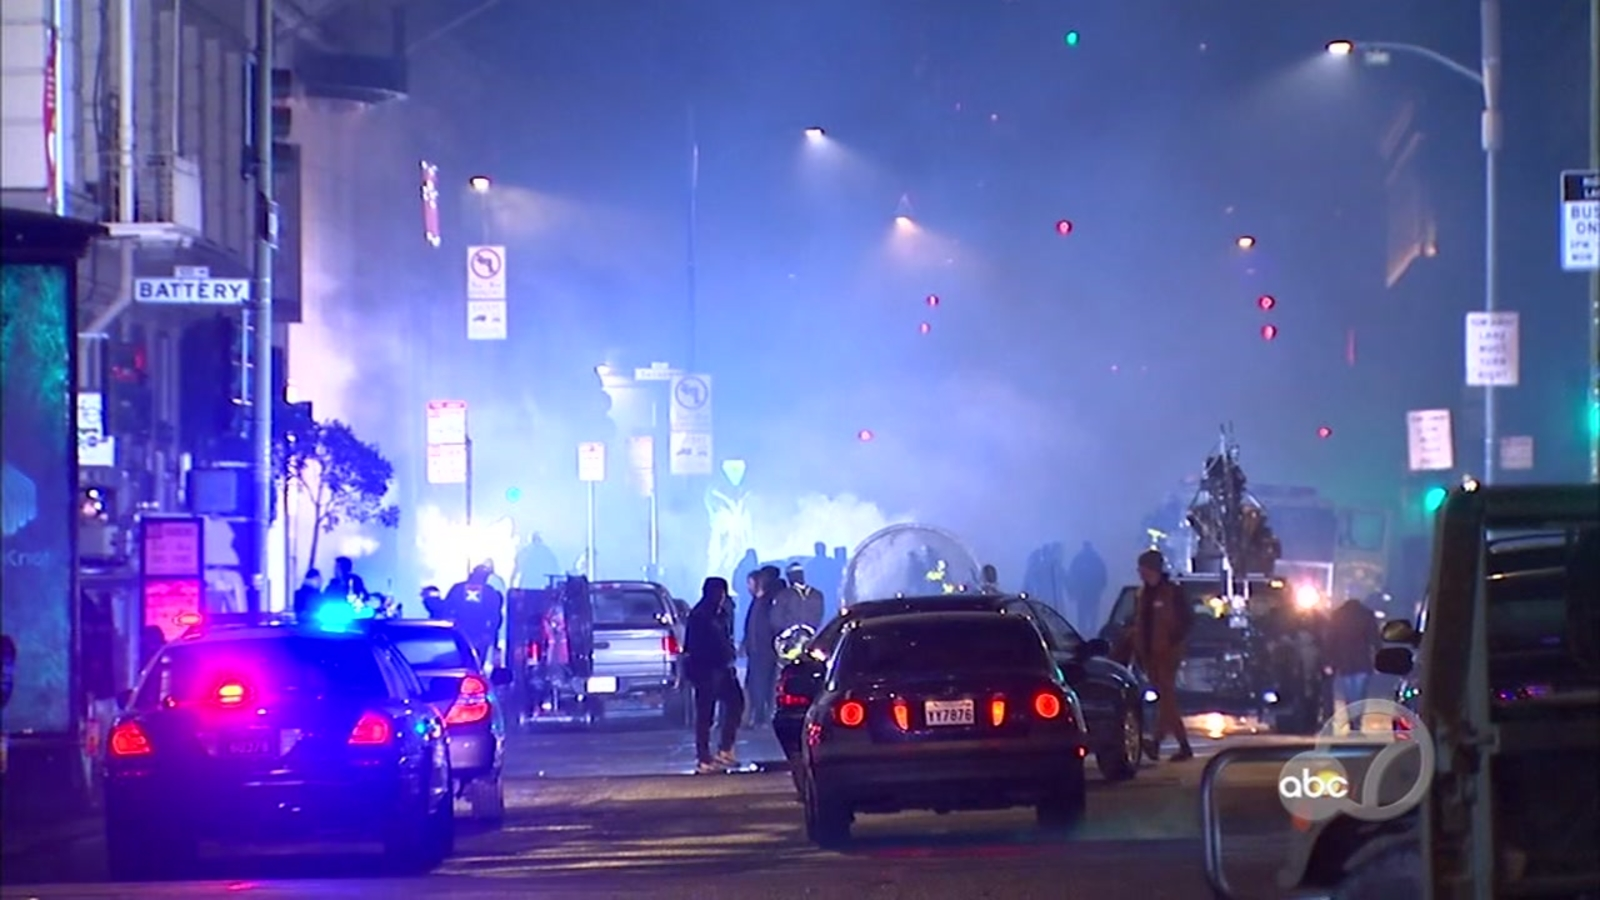 'Matrix 4' filming makes San Francisco's Financial District look like war zone